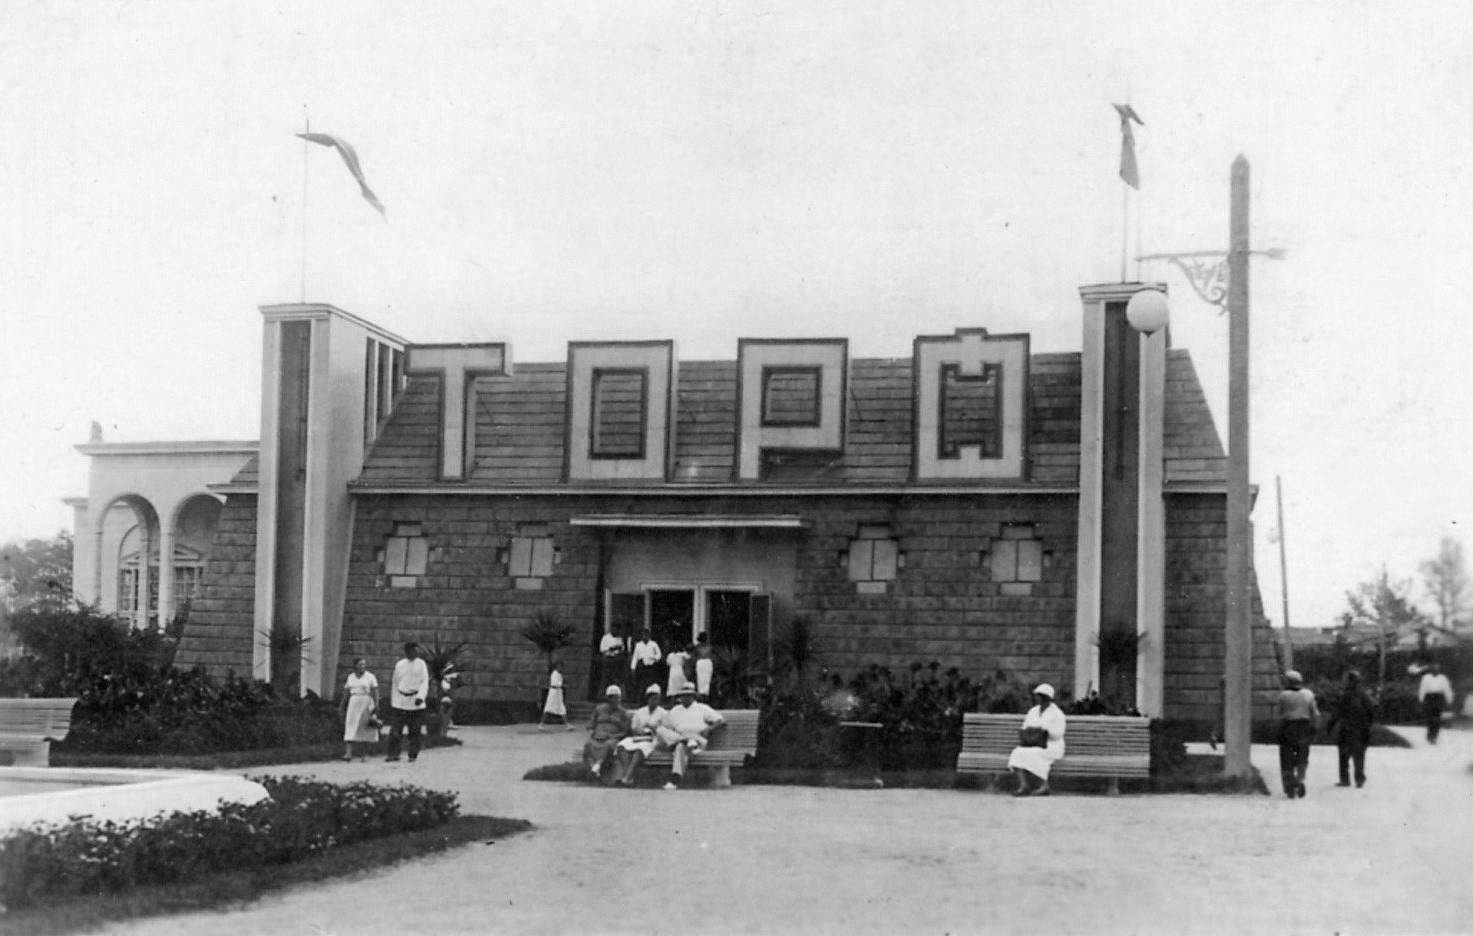 'Peat' pavilion